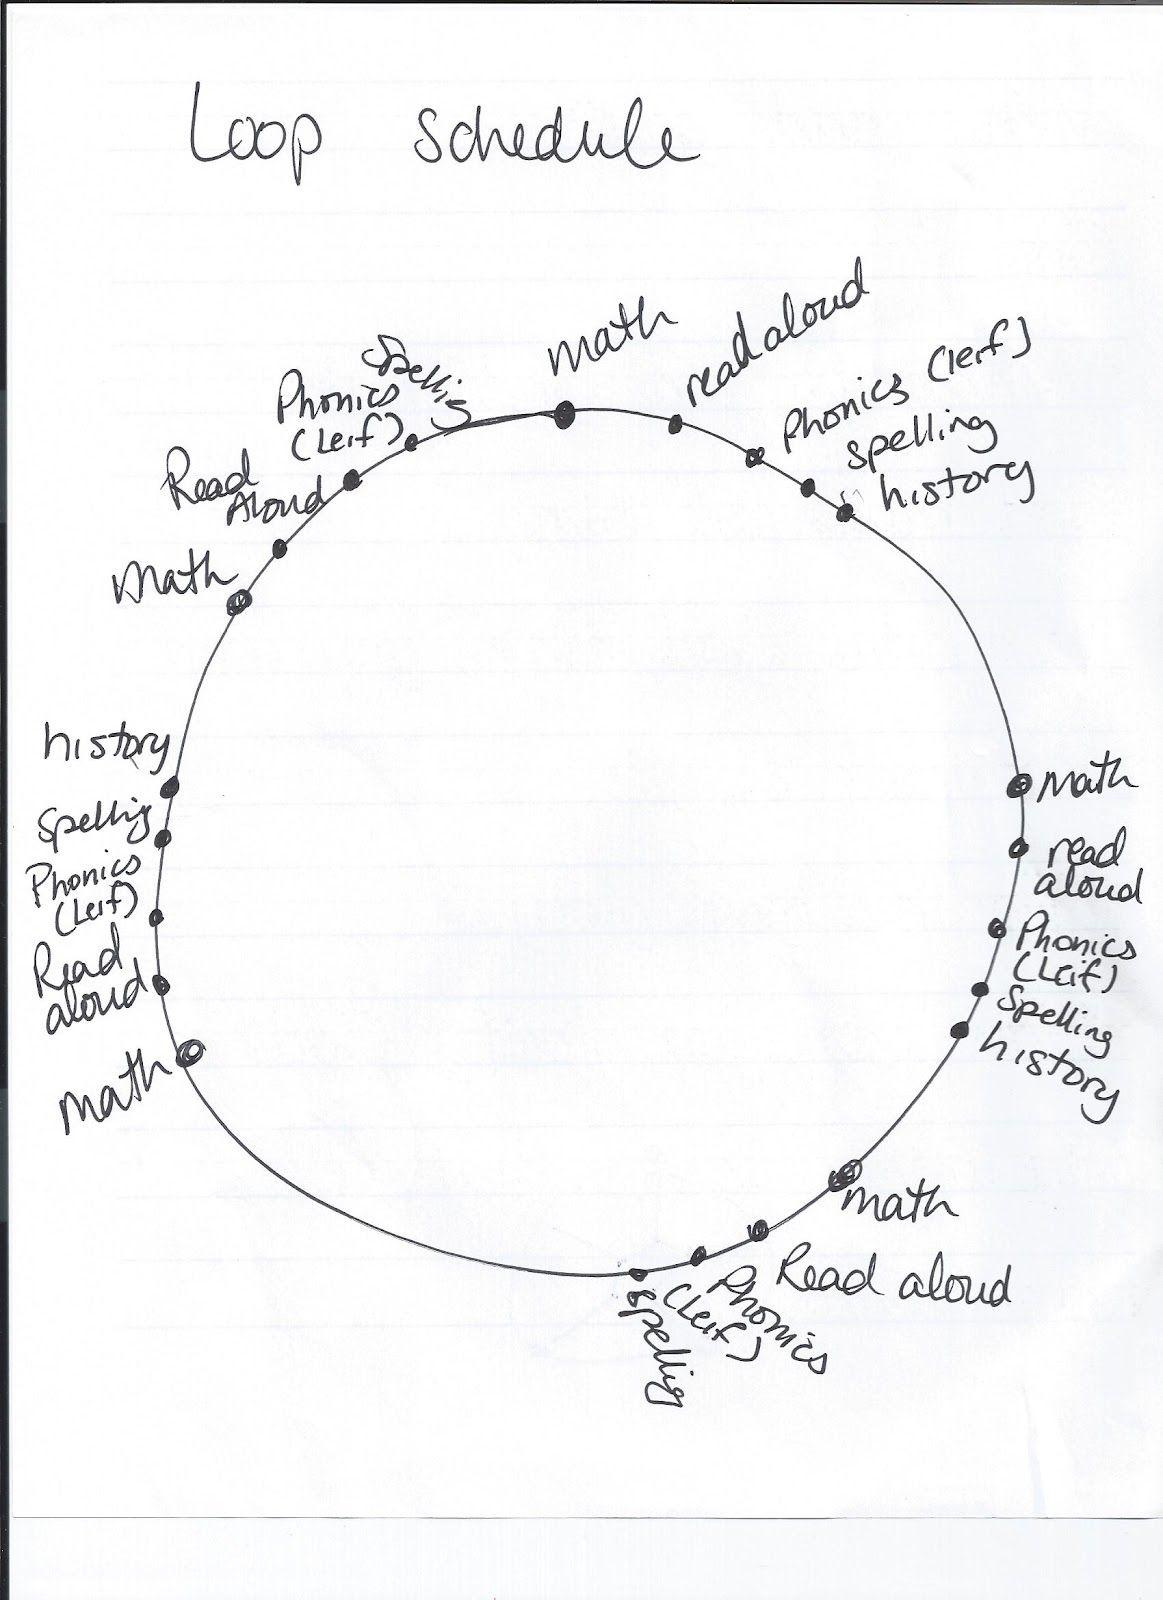 Homeschooling With the Kvenvoldens: The Homeschool Loop